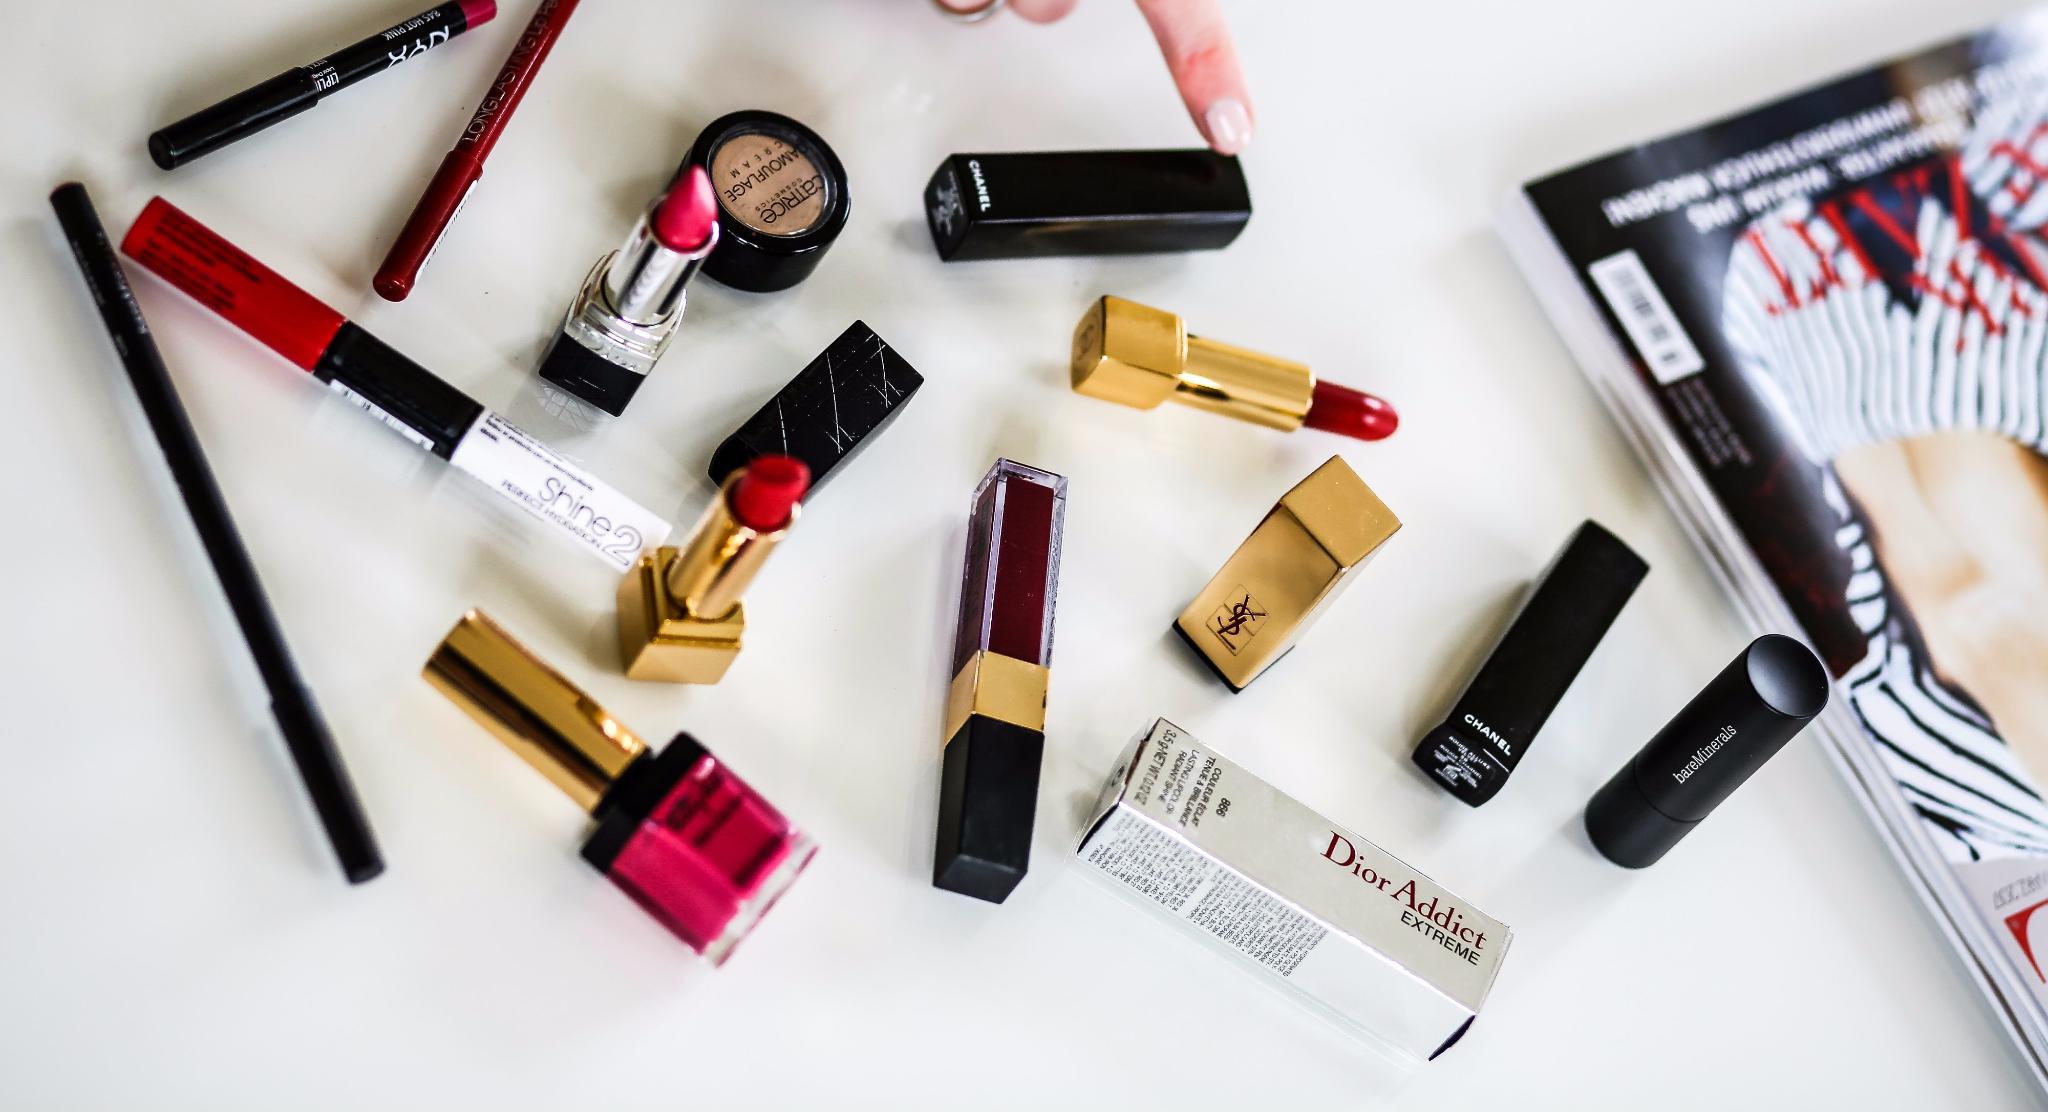 MOD-by-Monique-Lifestyle-Beauty-My-favourite-lipsticks-9-1